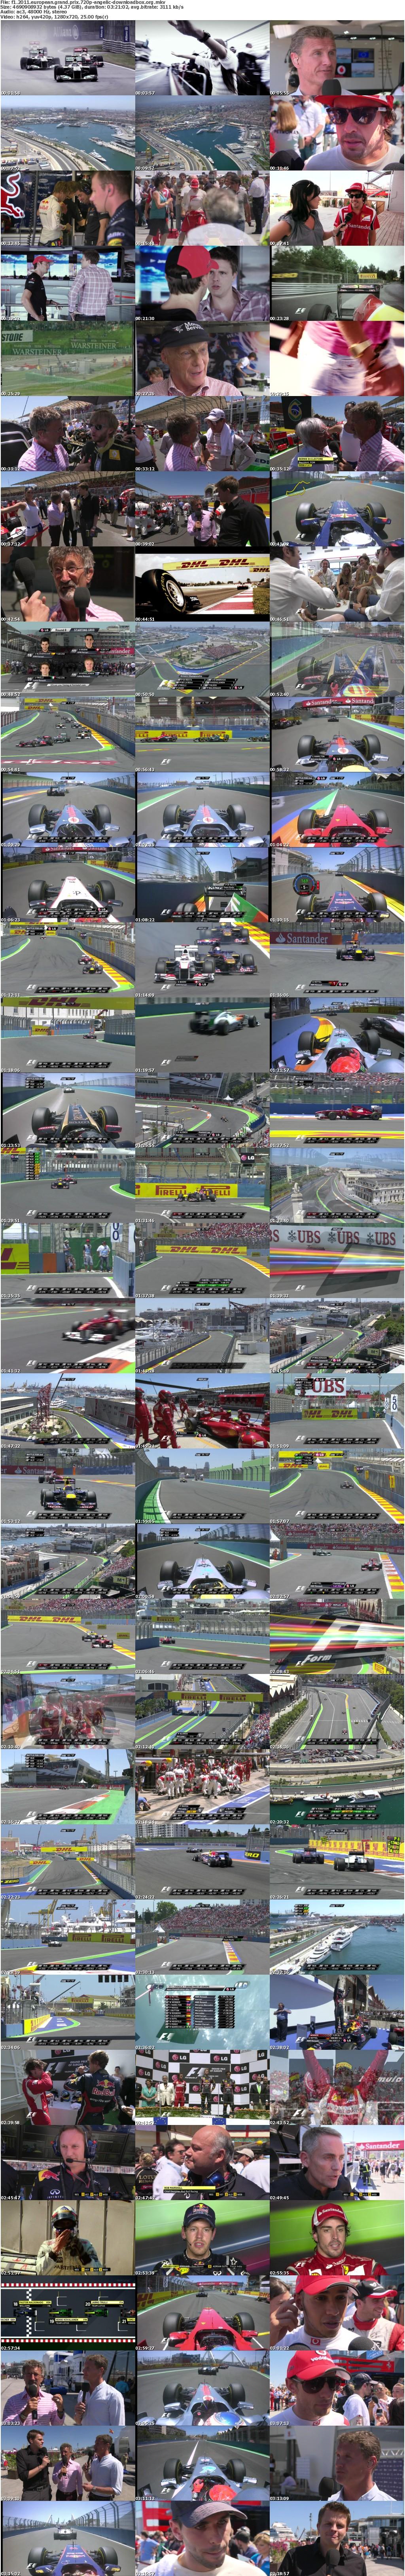 Formula1 2011 European Grand Prix 720p HDTV x264-ANGELiC